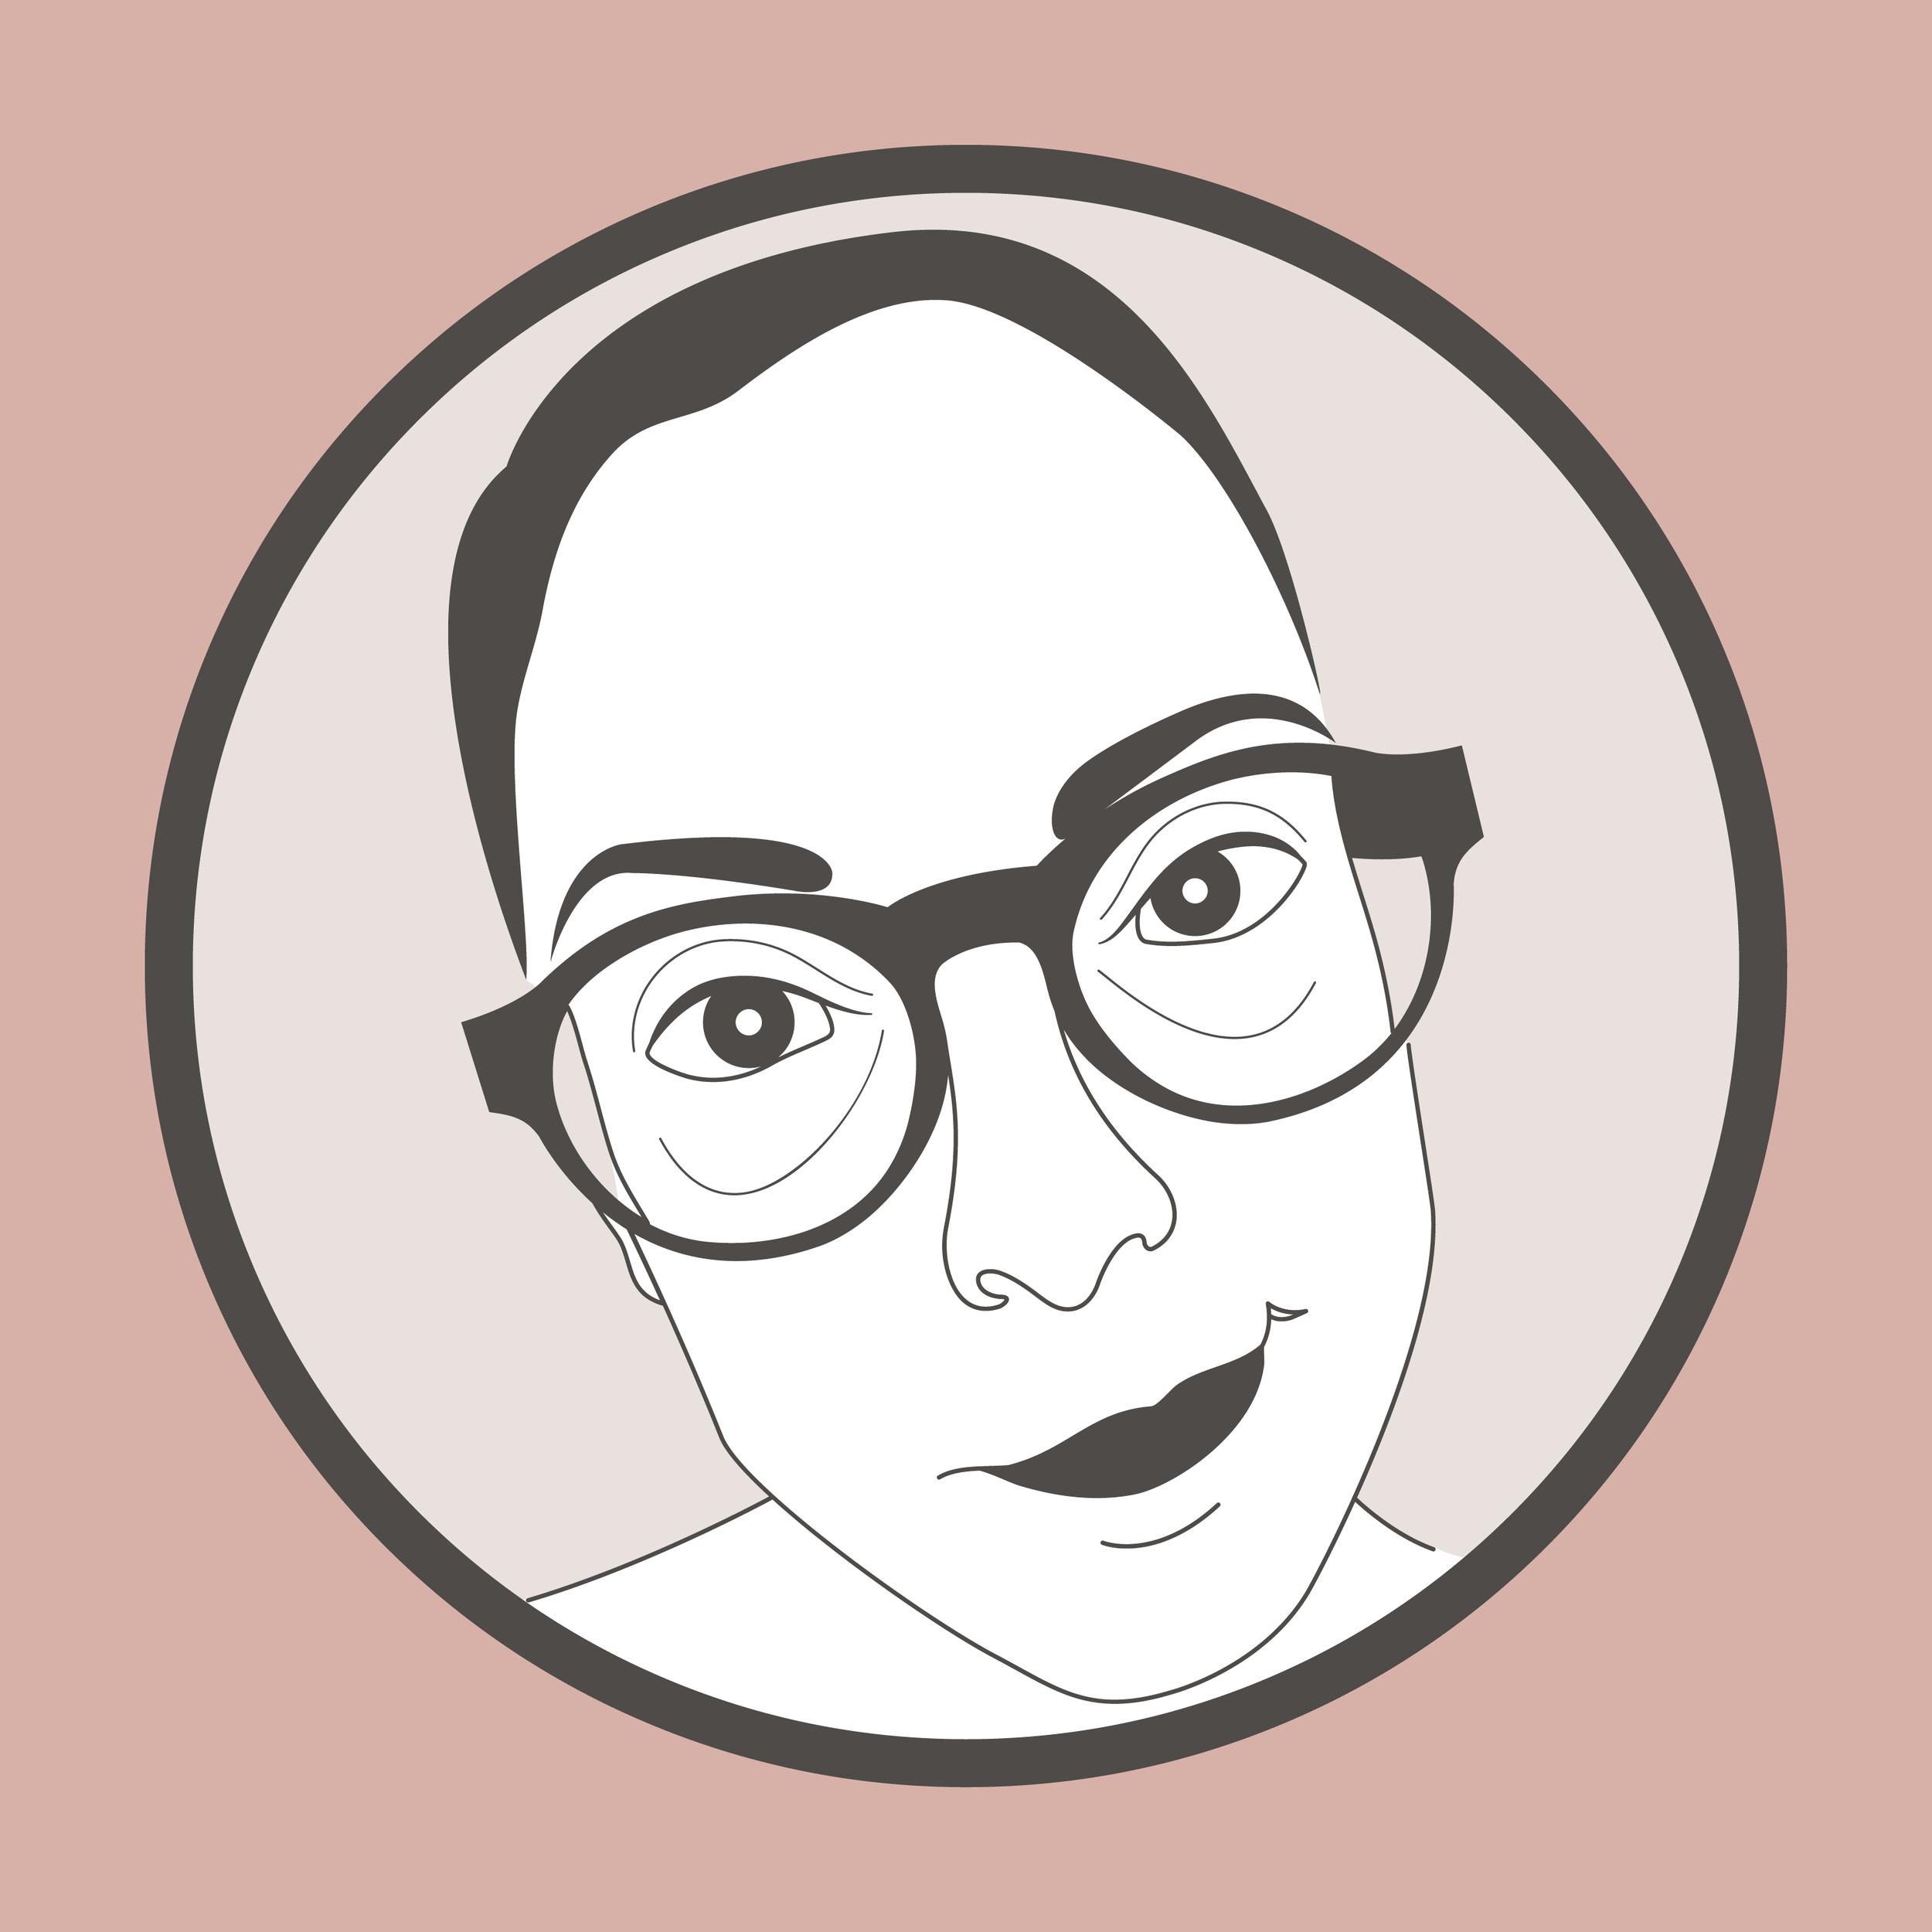 jasmin-plouffe-logo-and-web-design-06.png